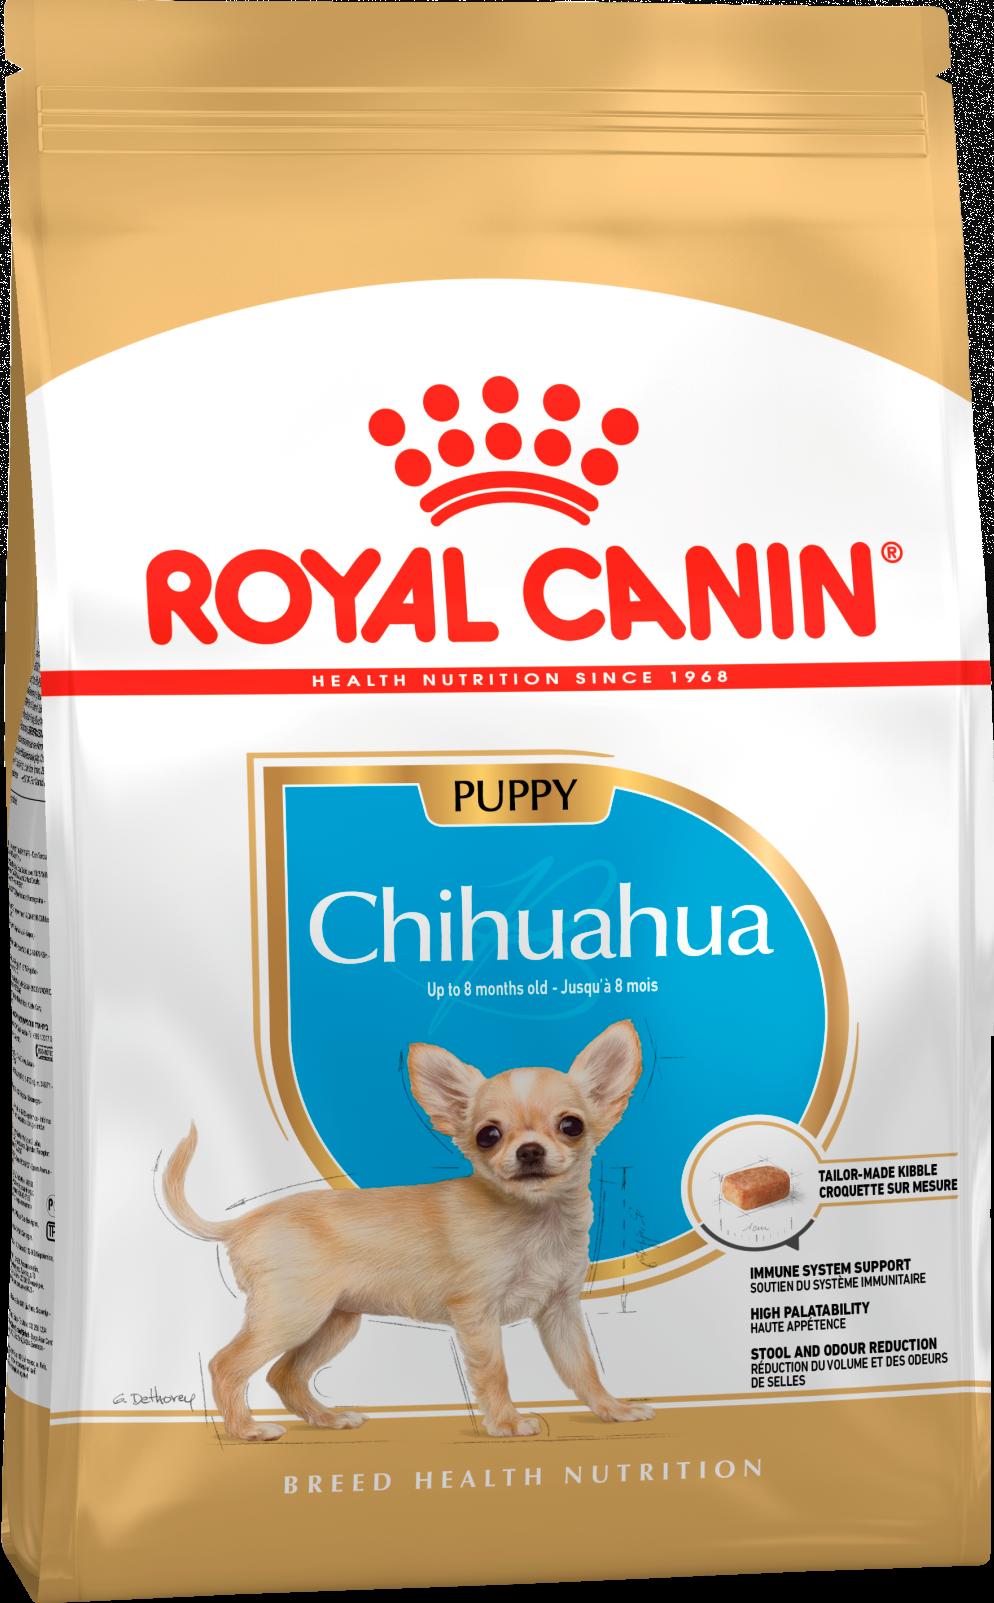 Royal Canin Корм для щенков собак породы чихуахуа, Royal Canin Chihuahua Junior 319005.png